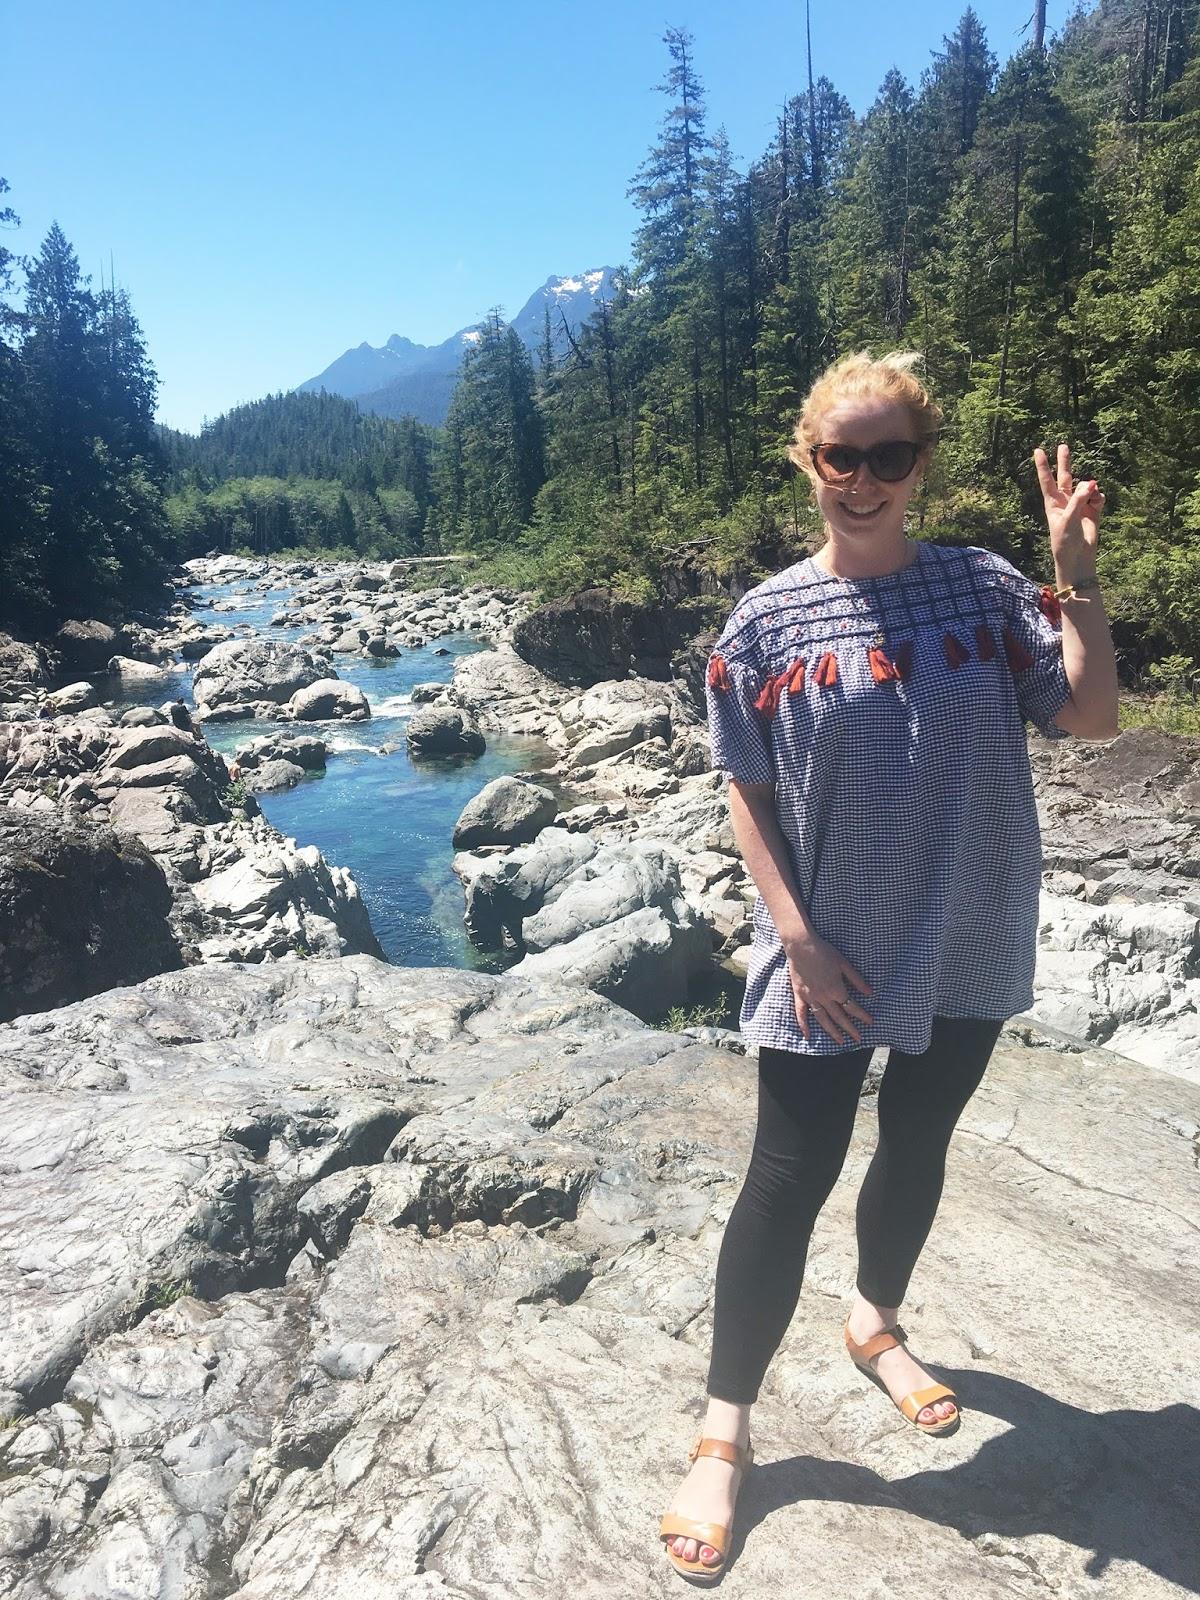 Kat in Canada